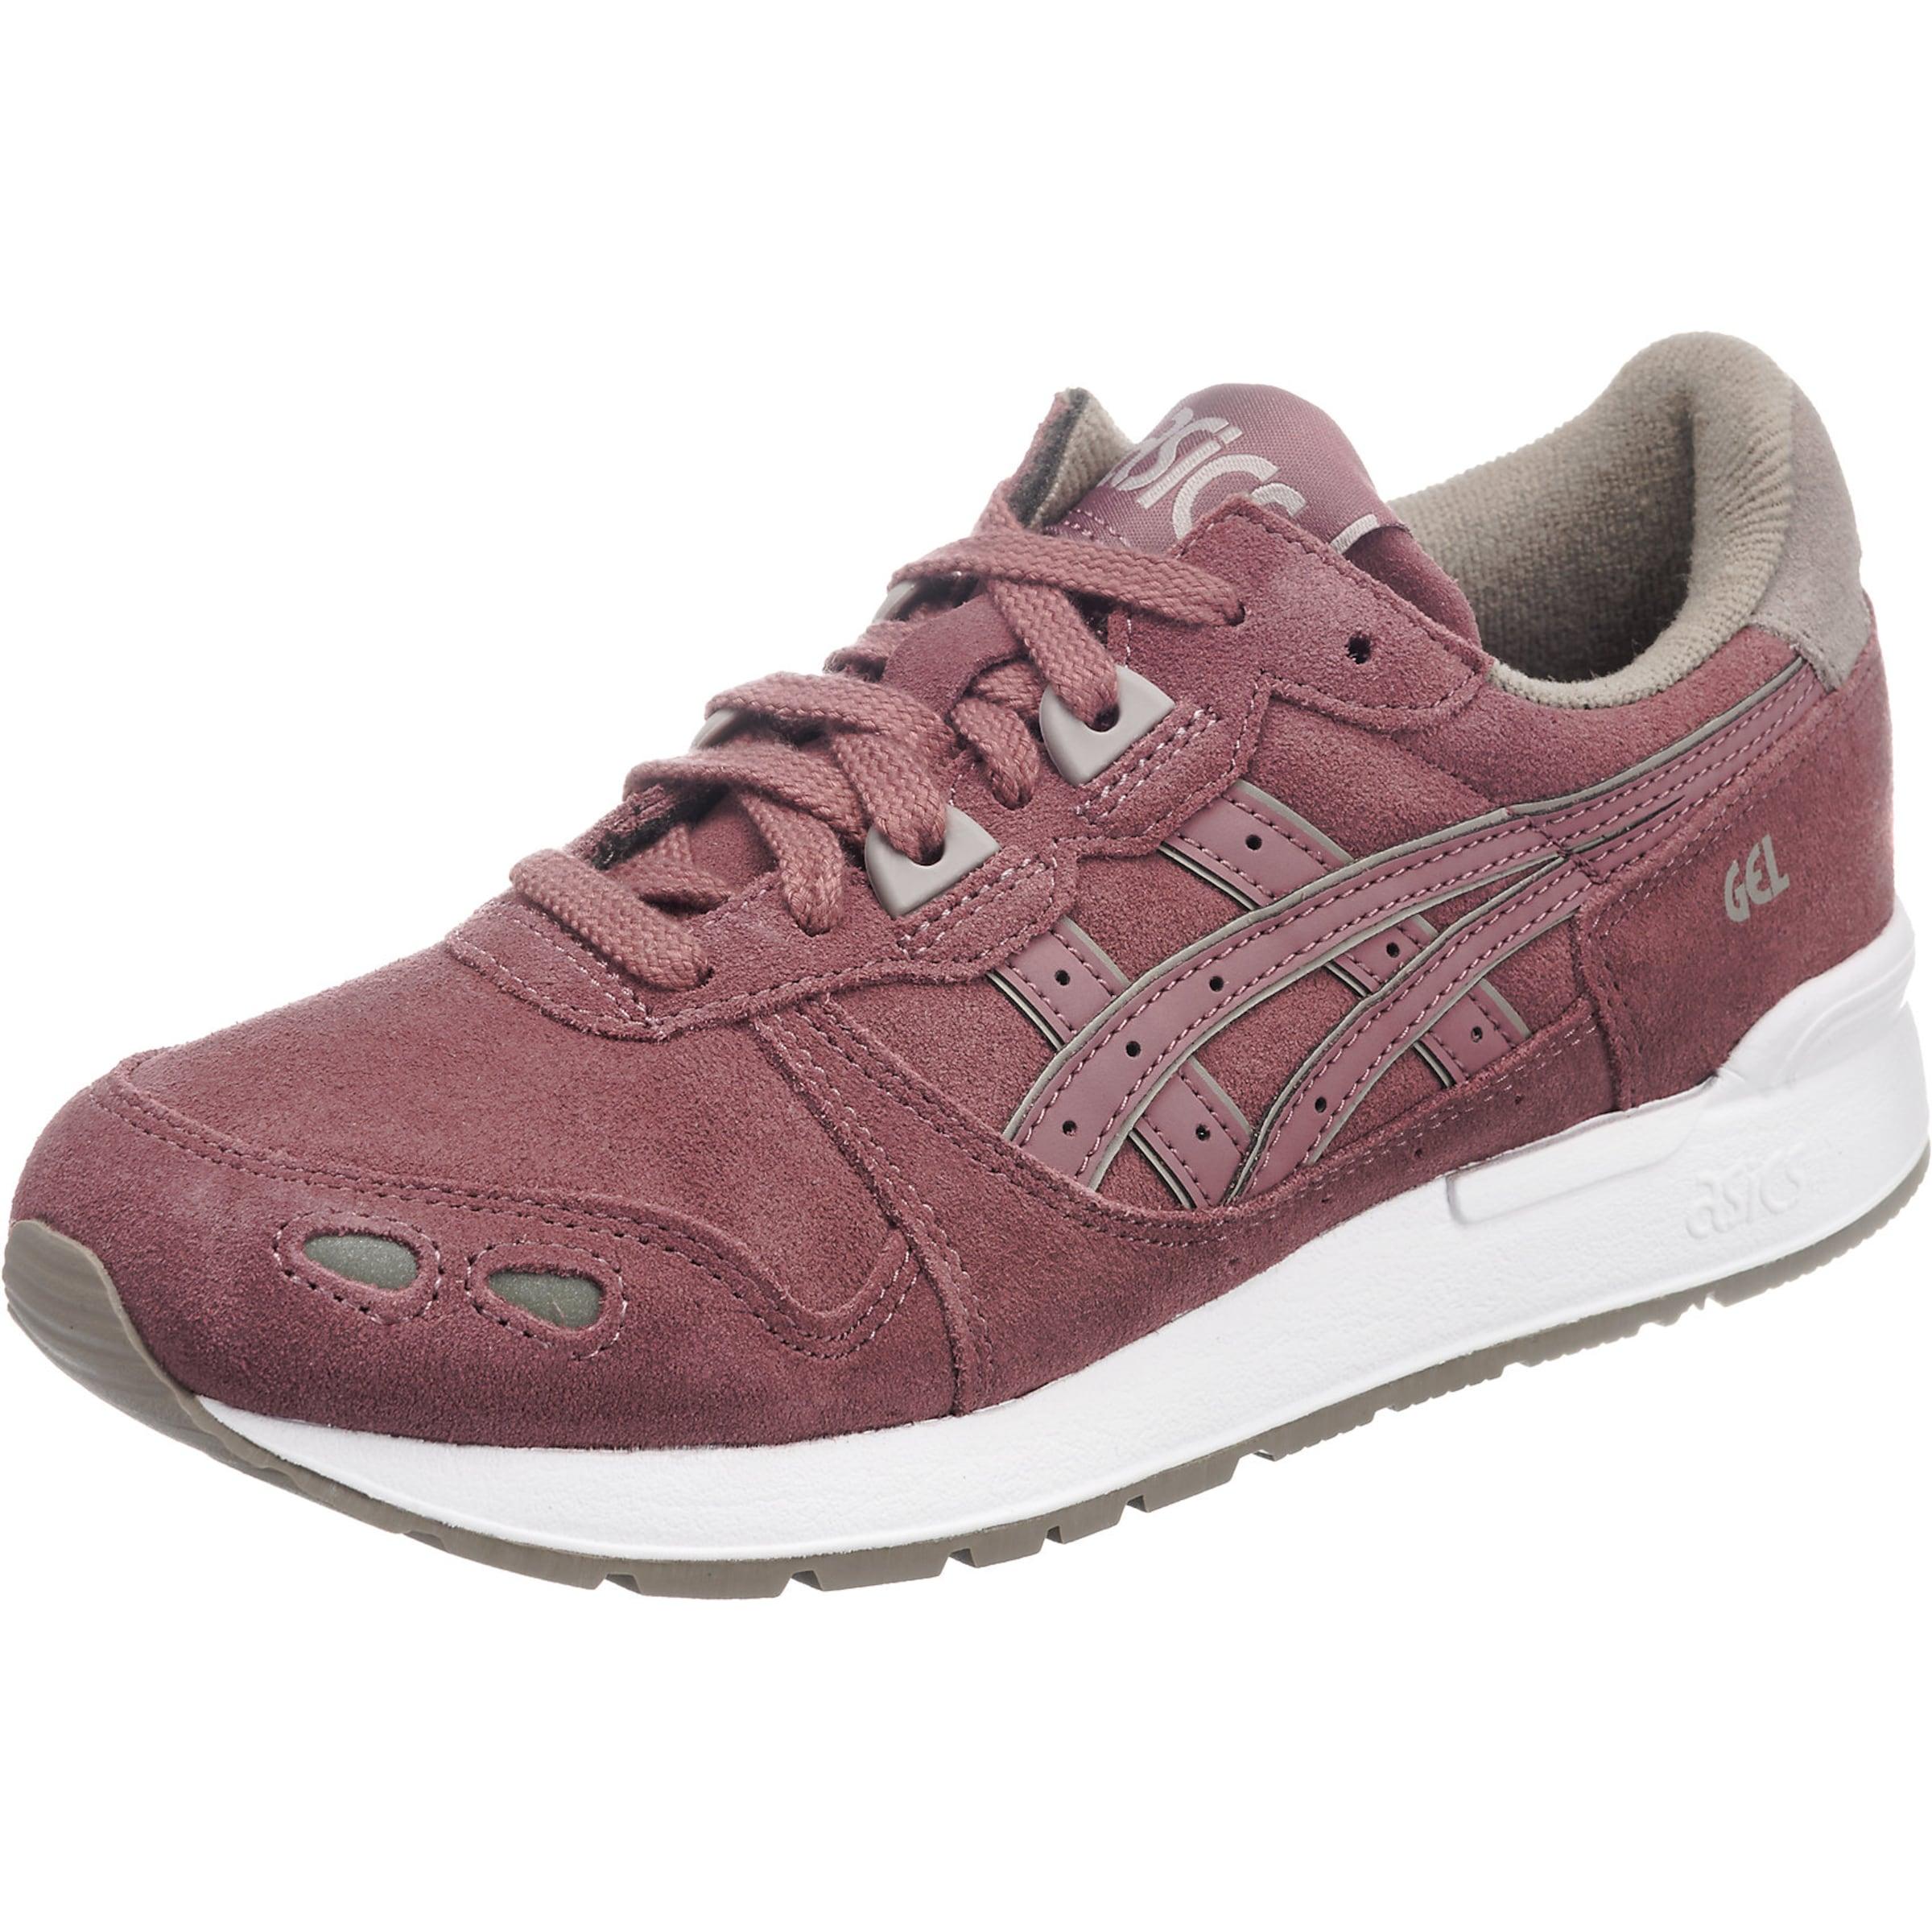 Asics Tiger Sneakers Sneakers Tiger Low  GEL-LYTE 6ec280